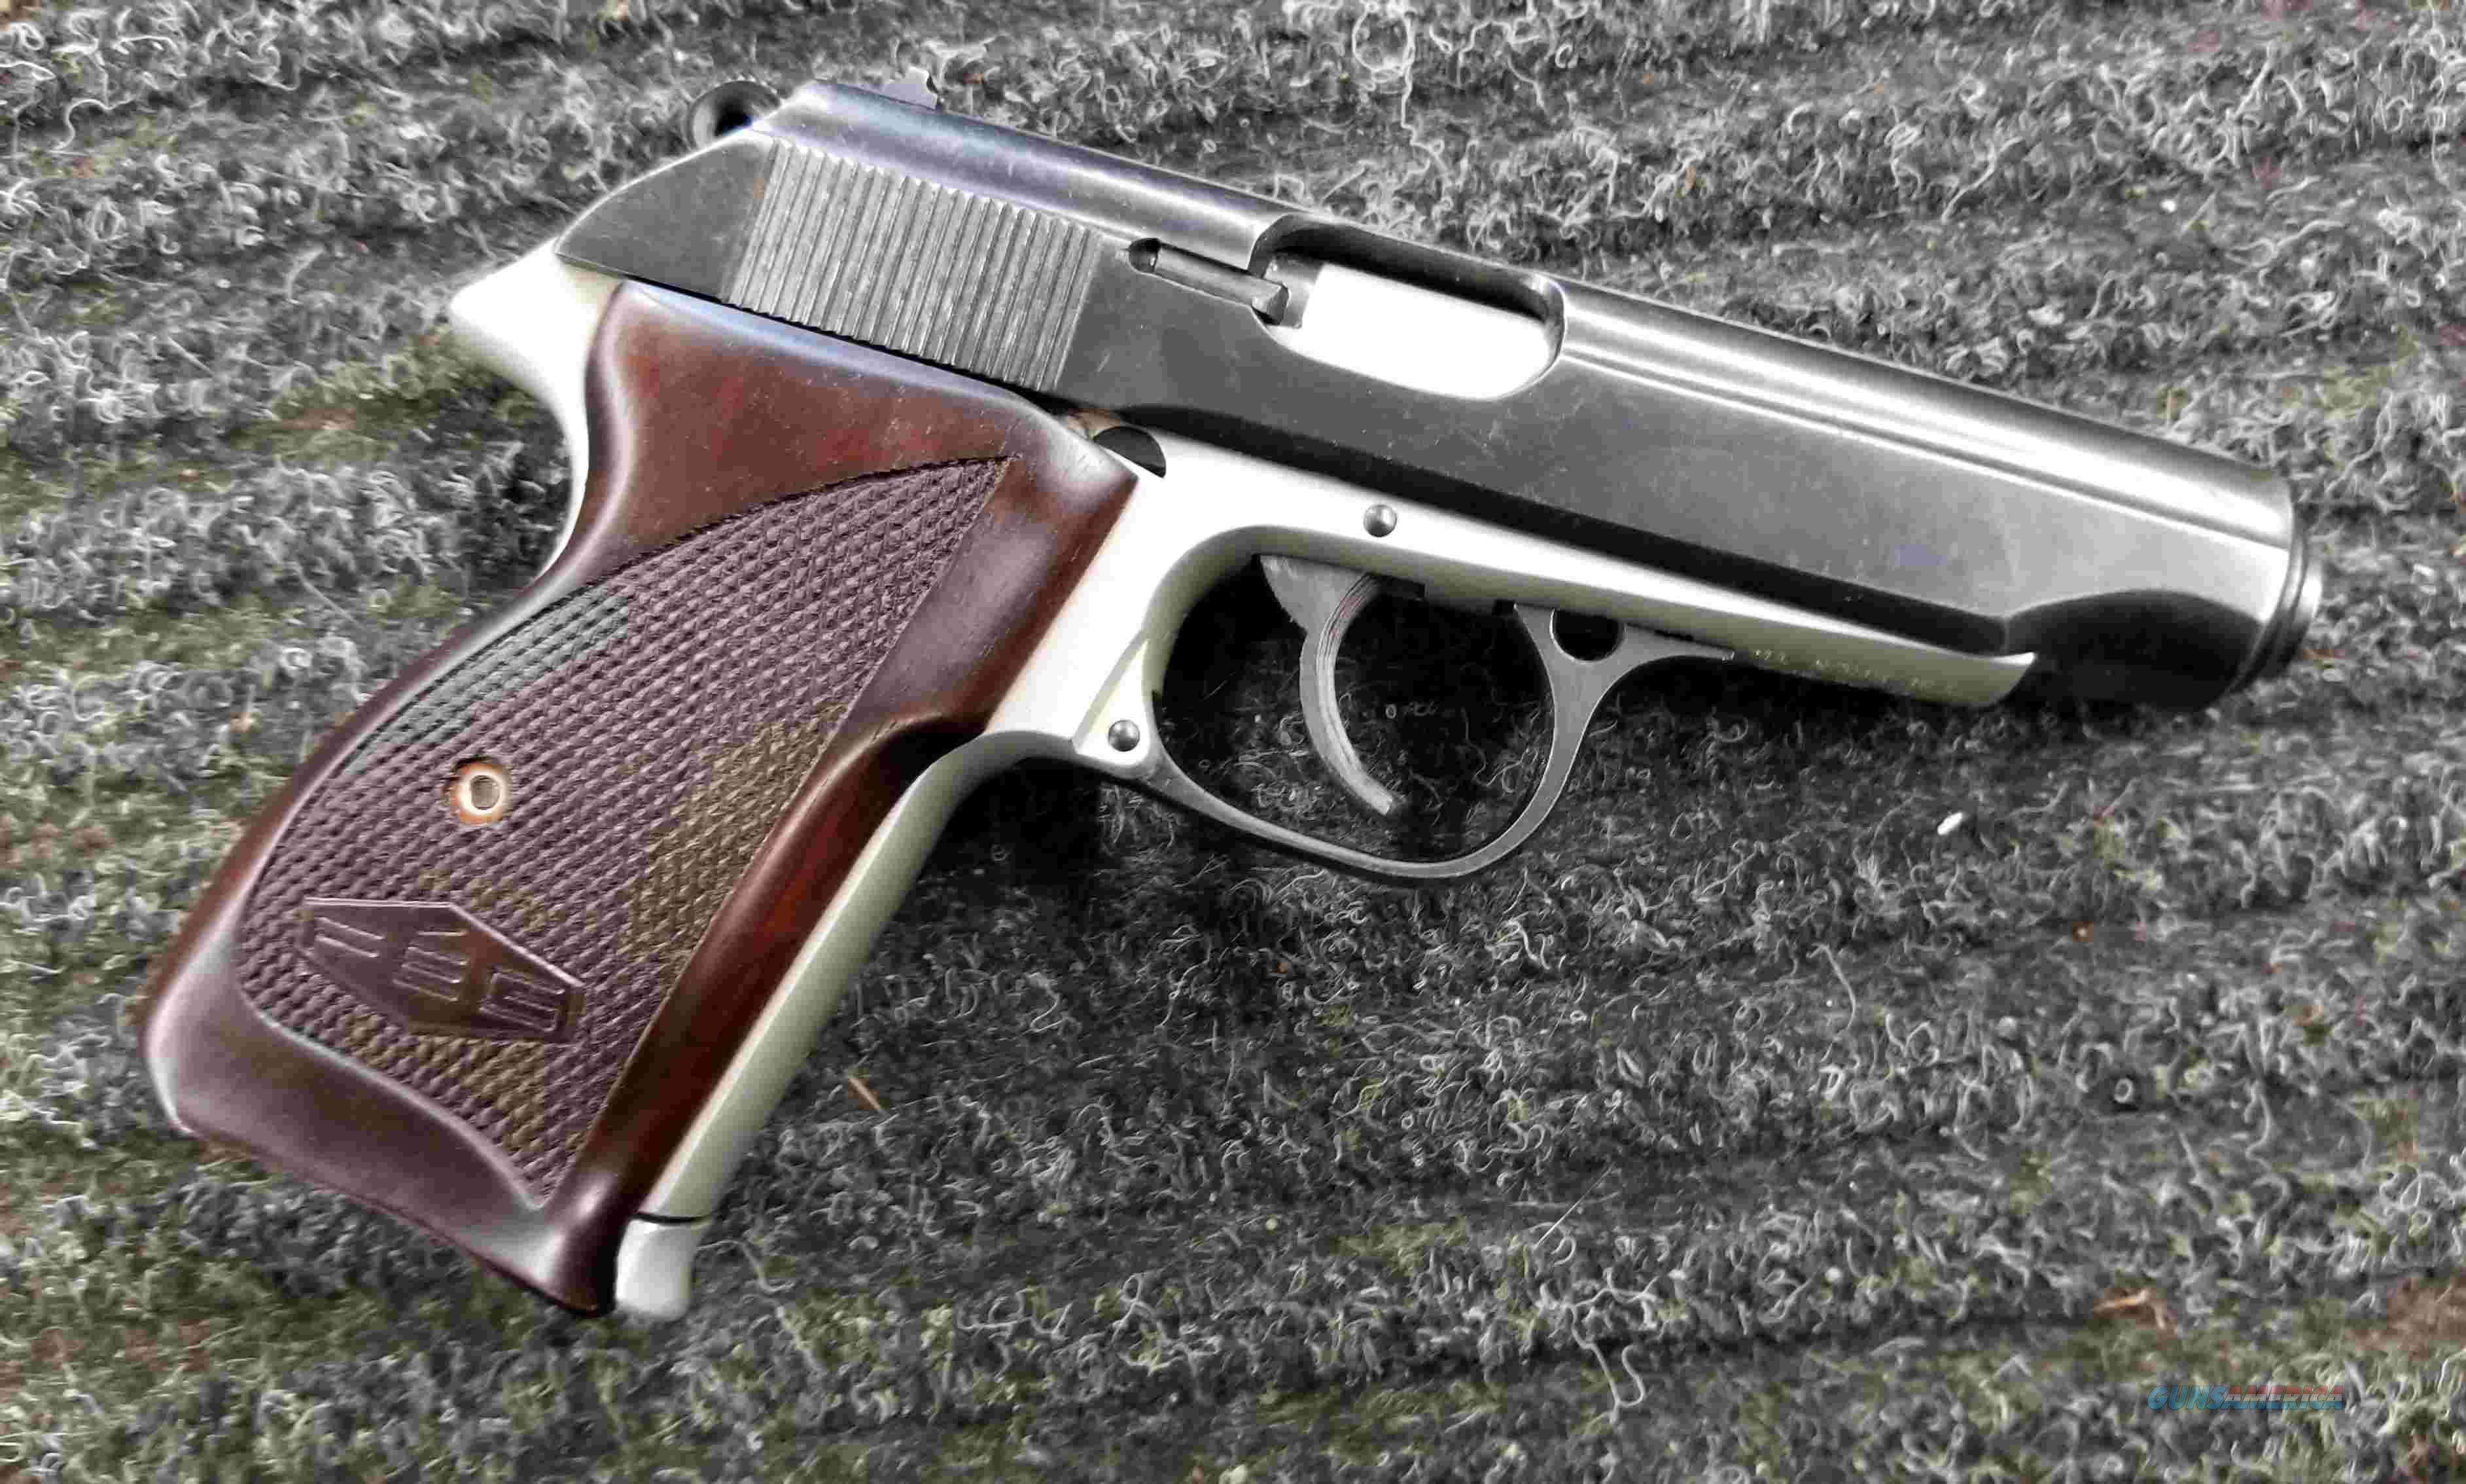 FEG PA63 9X18 - 3 Mags - Nice Grips - Free Shipping !!  Guns > Pistols > FEG Pistols